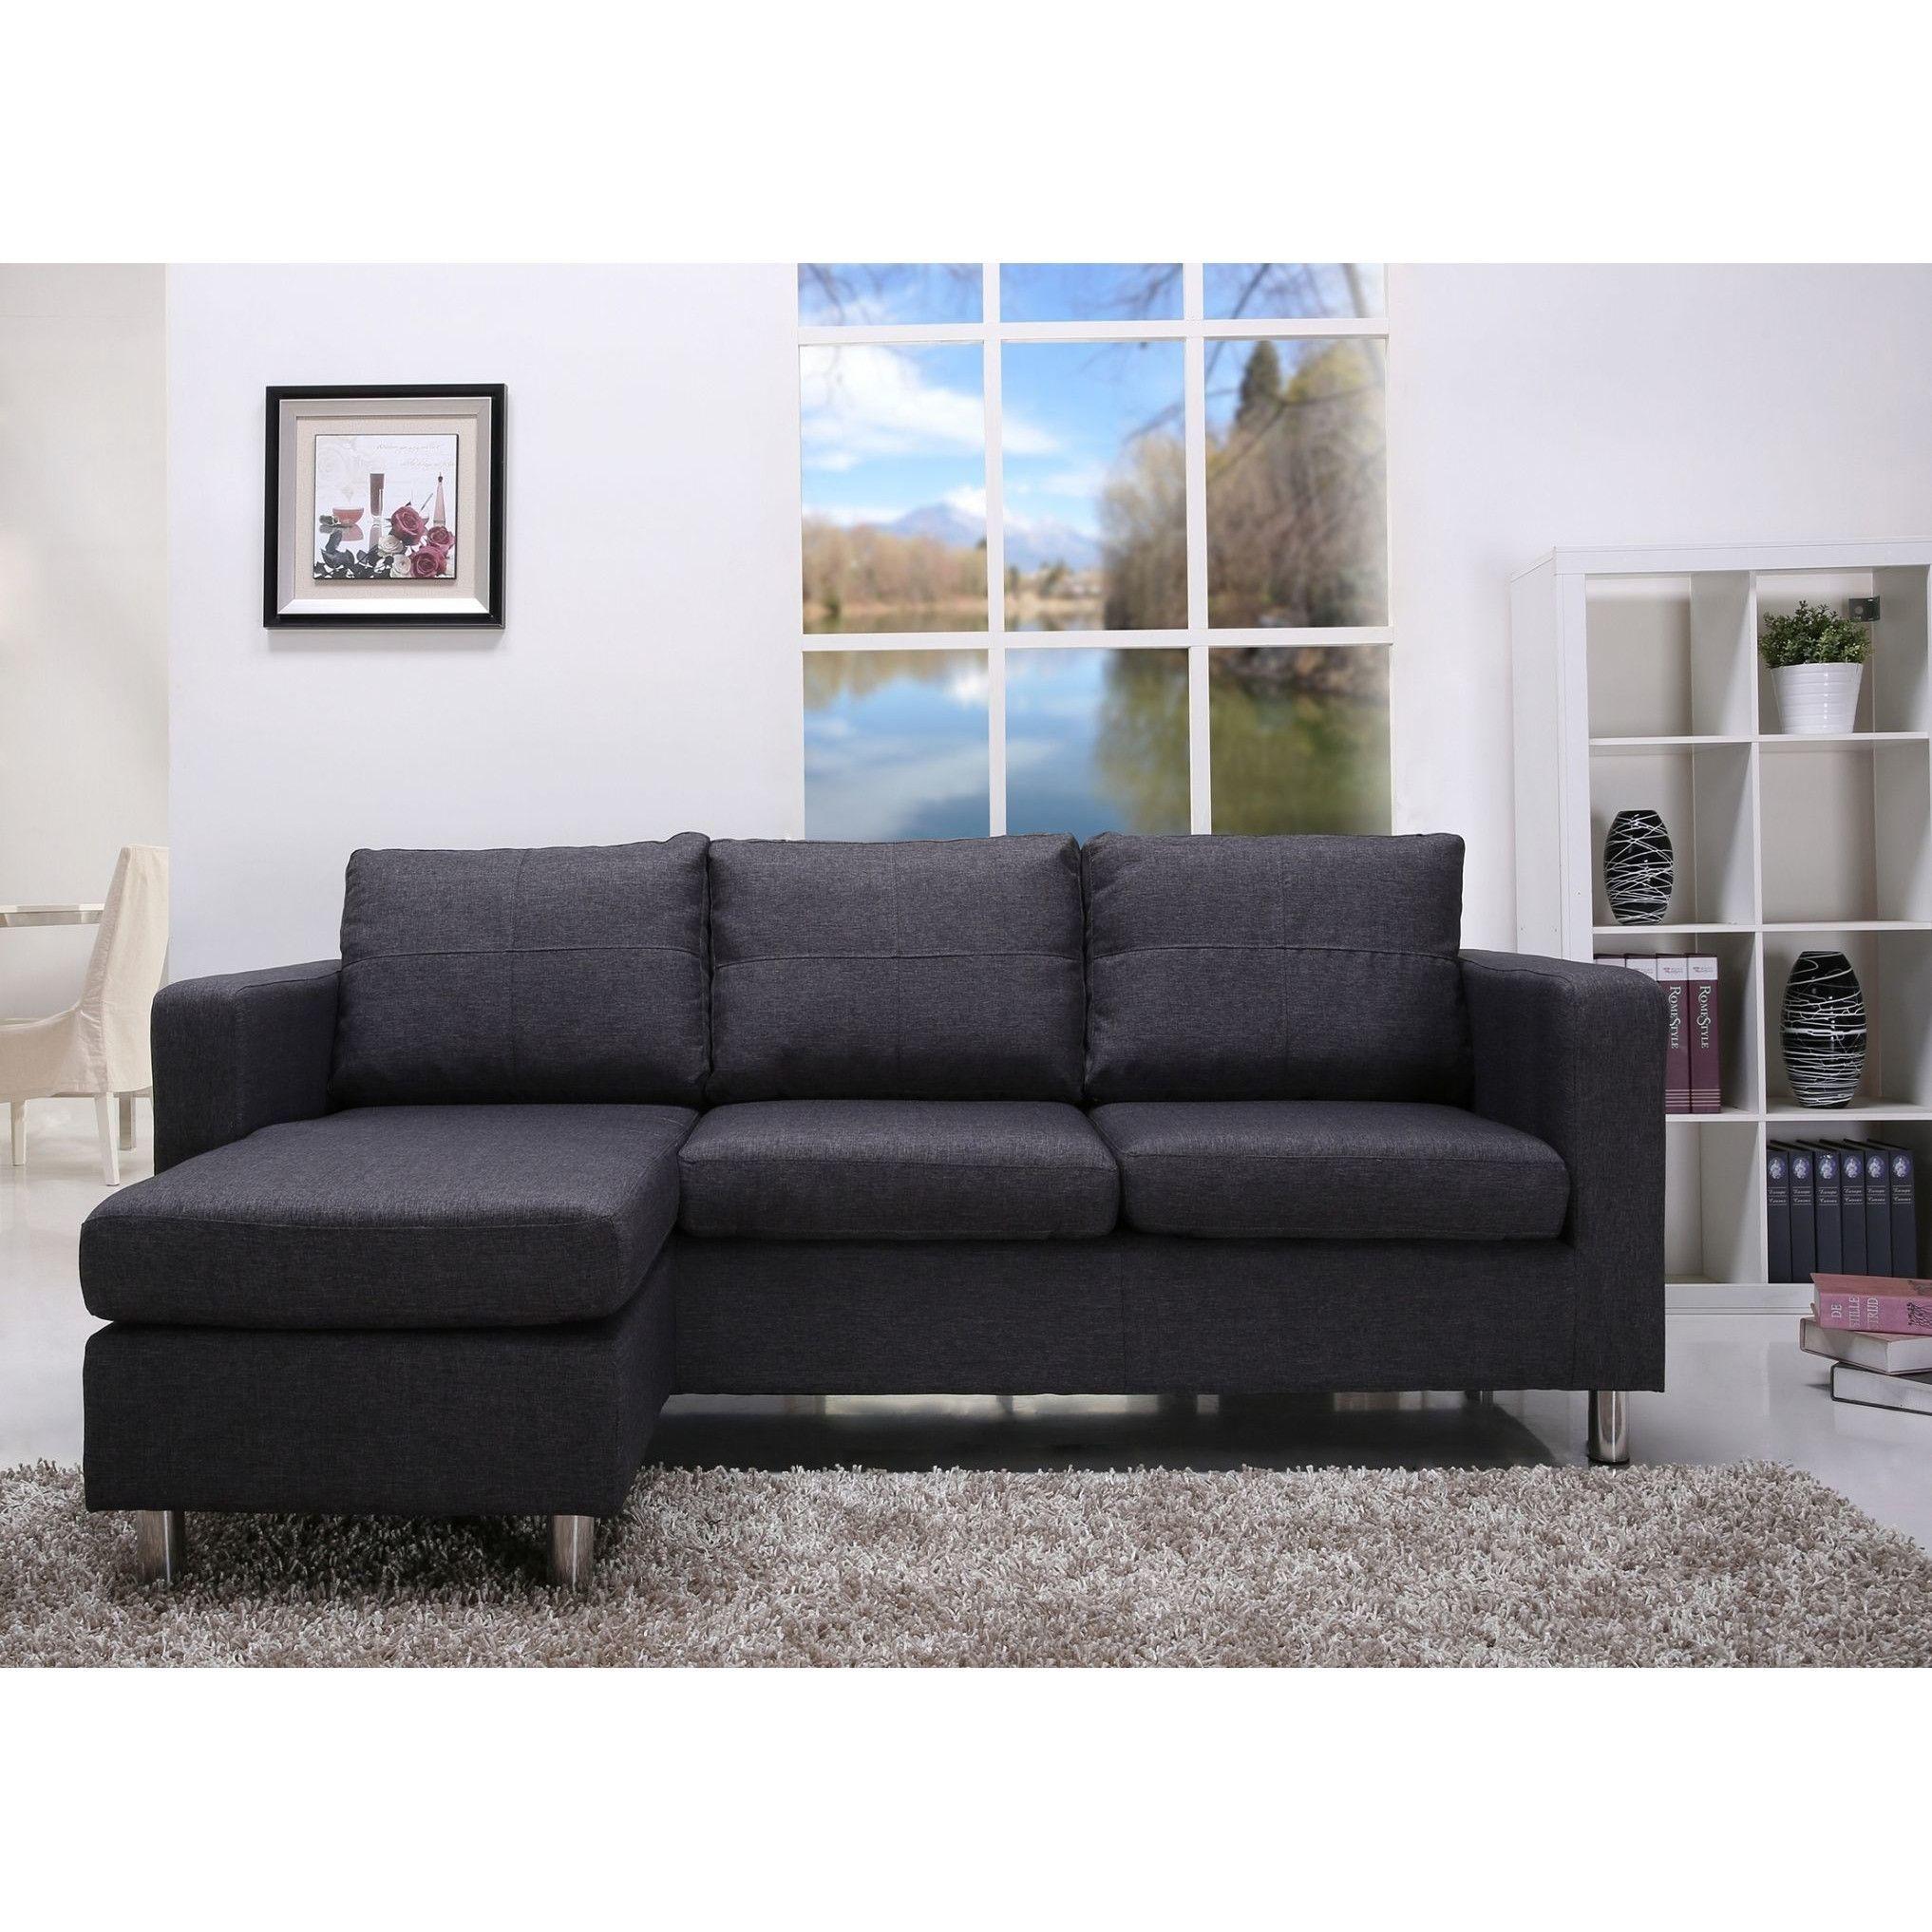 Leader Lifestyle Oxford Modular Corner Sofa Reviews Wayfair Uk Cornersofa Luxury Sofa Modern Sofa Modern Fabric Sofa